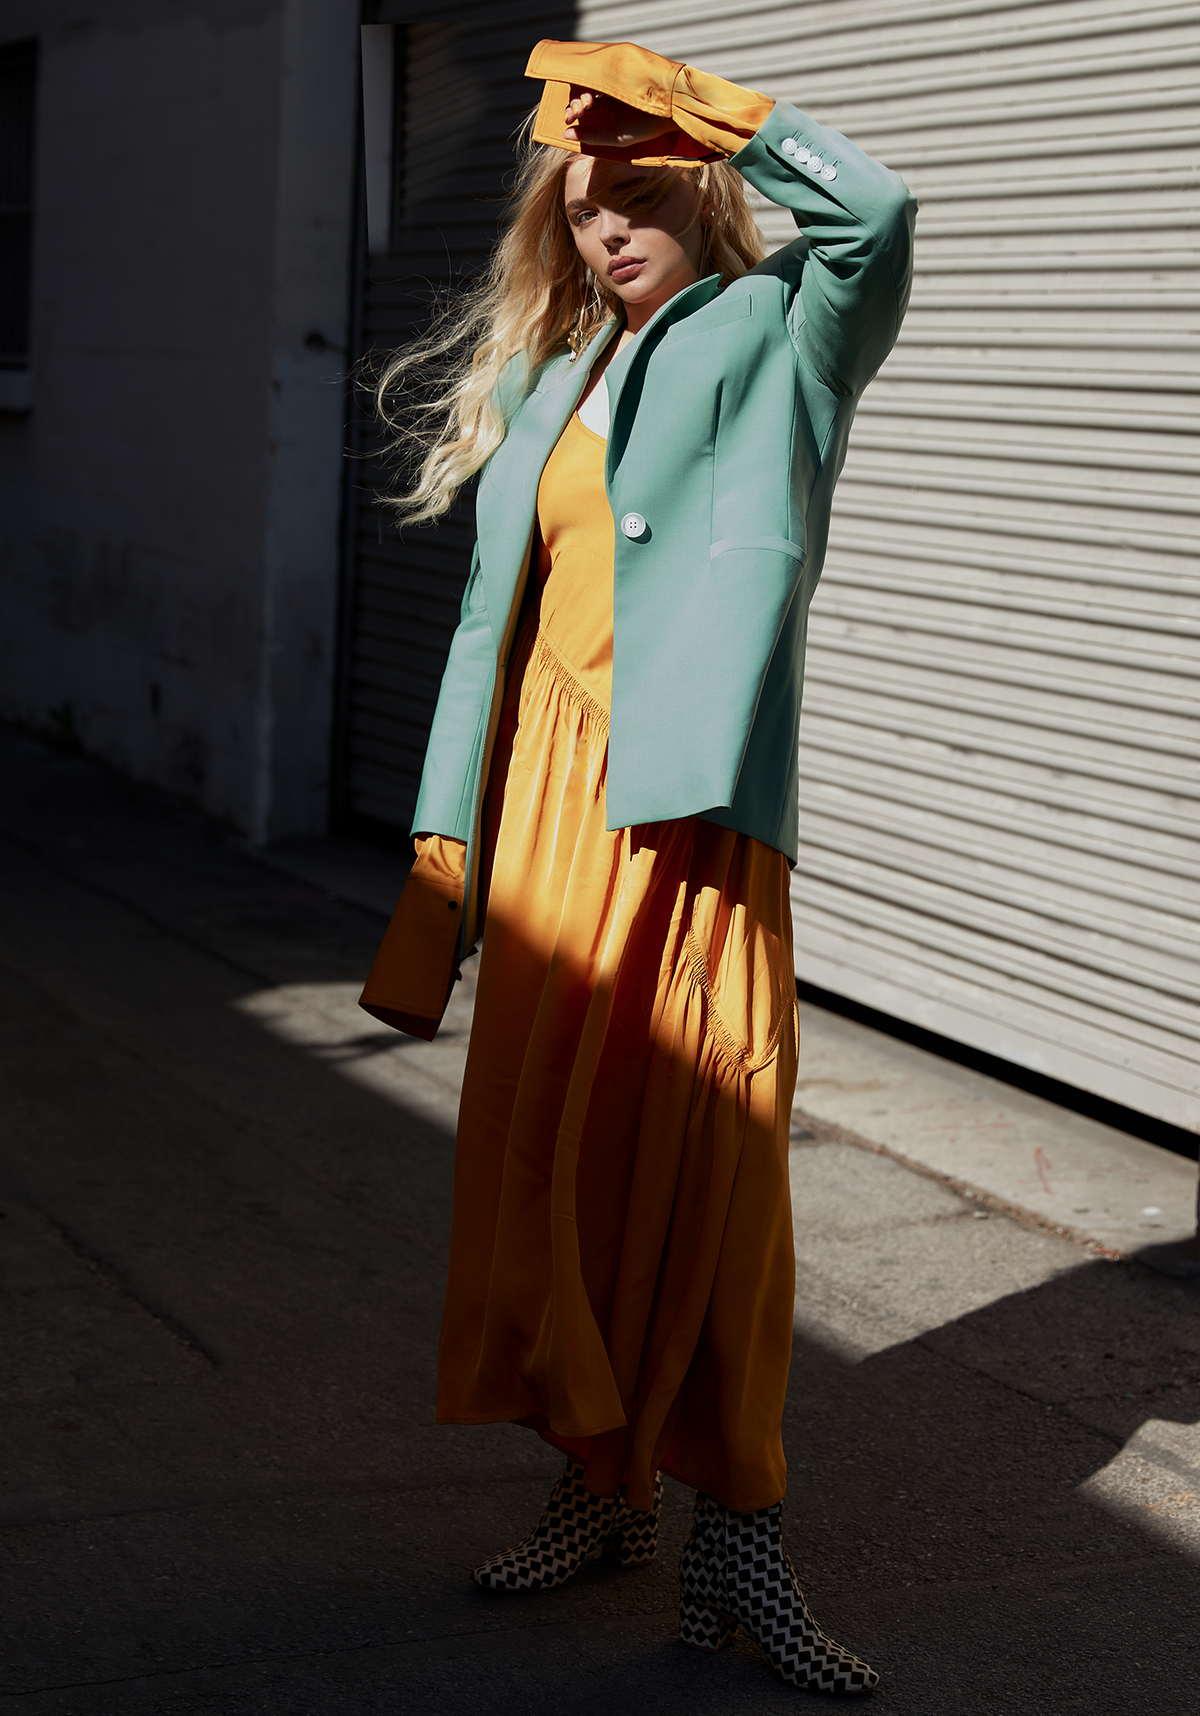 Chloë-Grace-Moretz-Photographed-by-Harper-Smith-for-Who-Wat-Wear-201800004.jpg